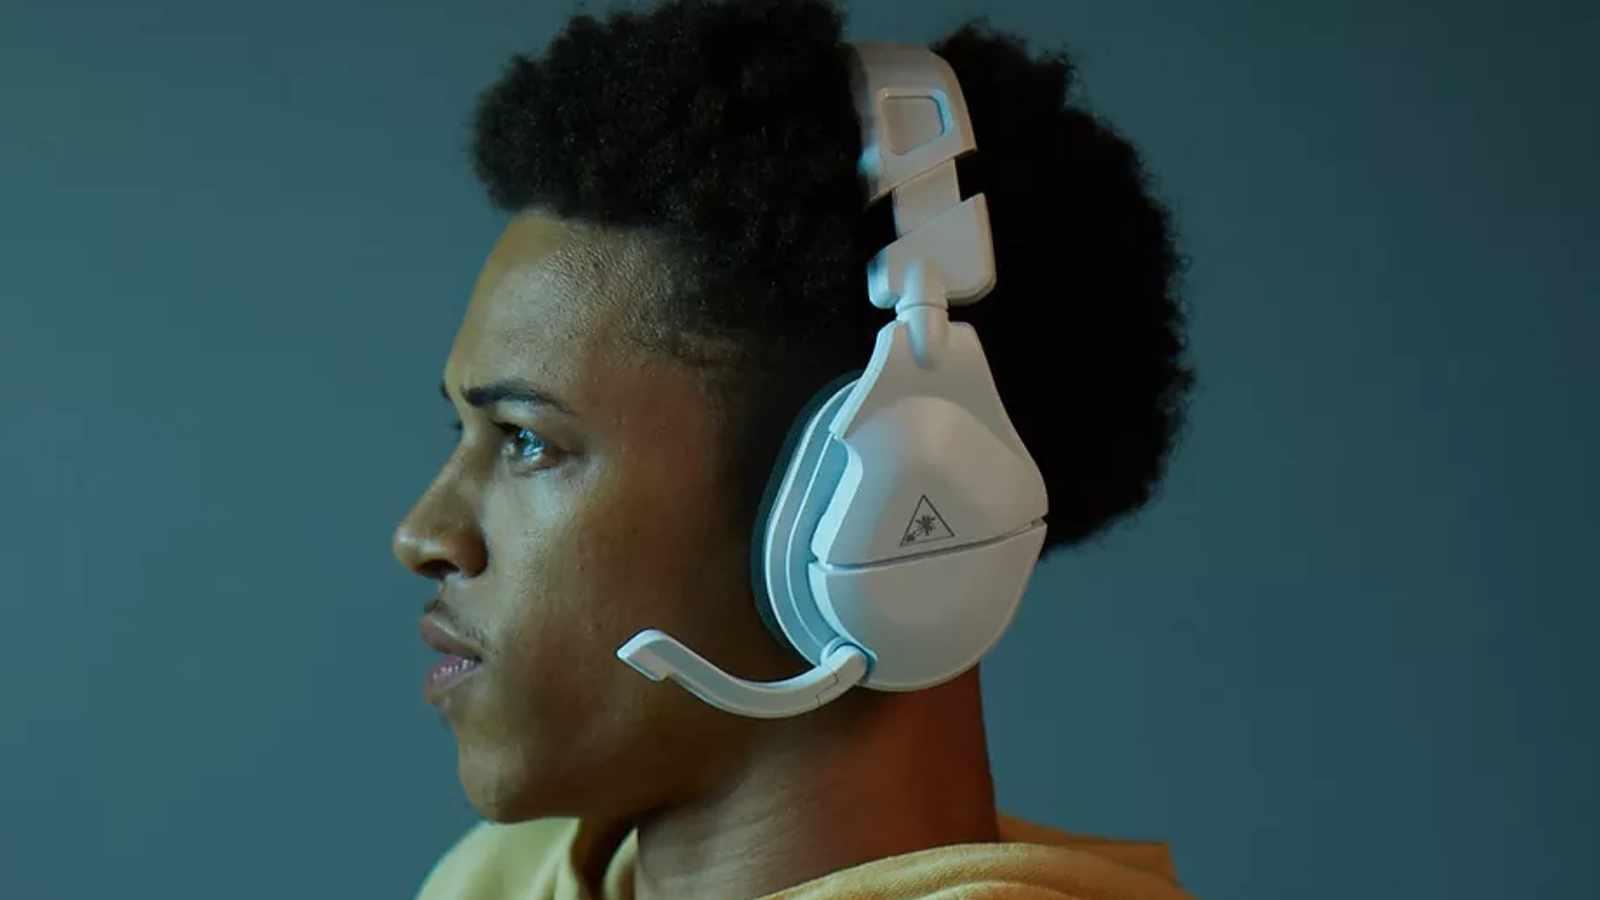 turtle beach stealth 600 gen 2 headset on man's head